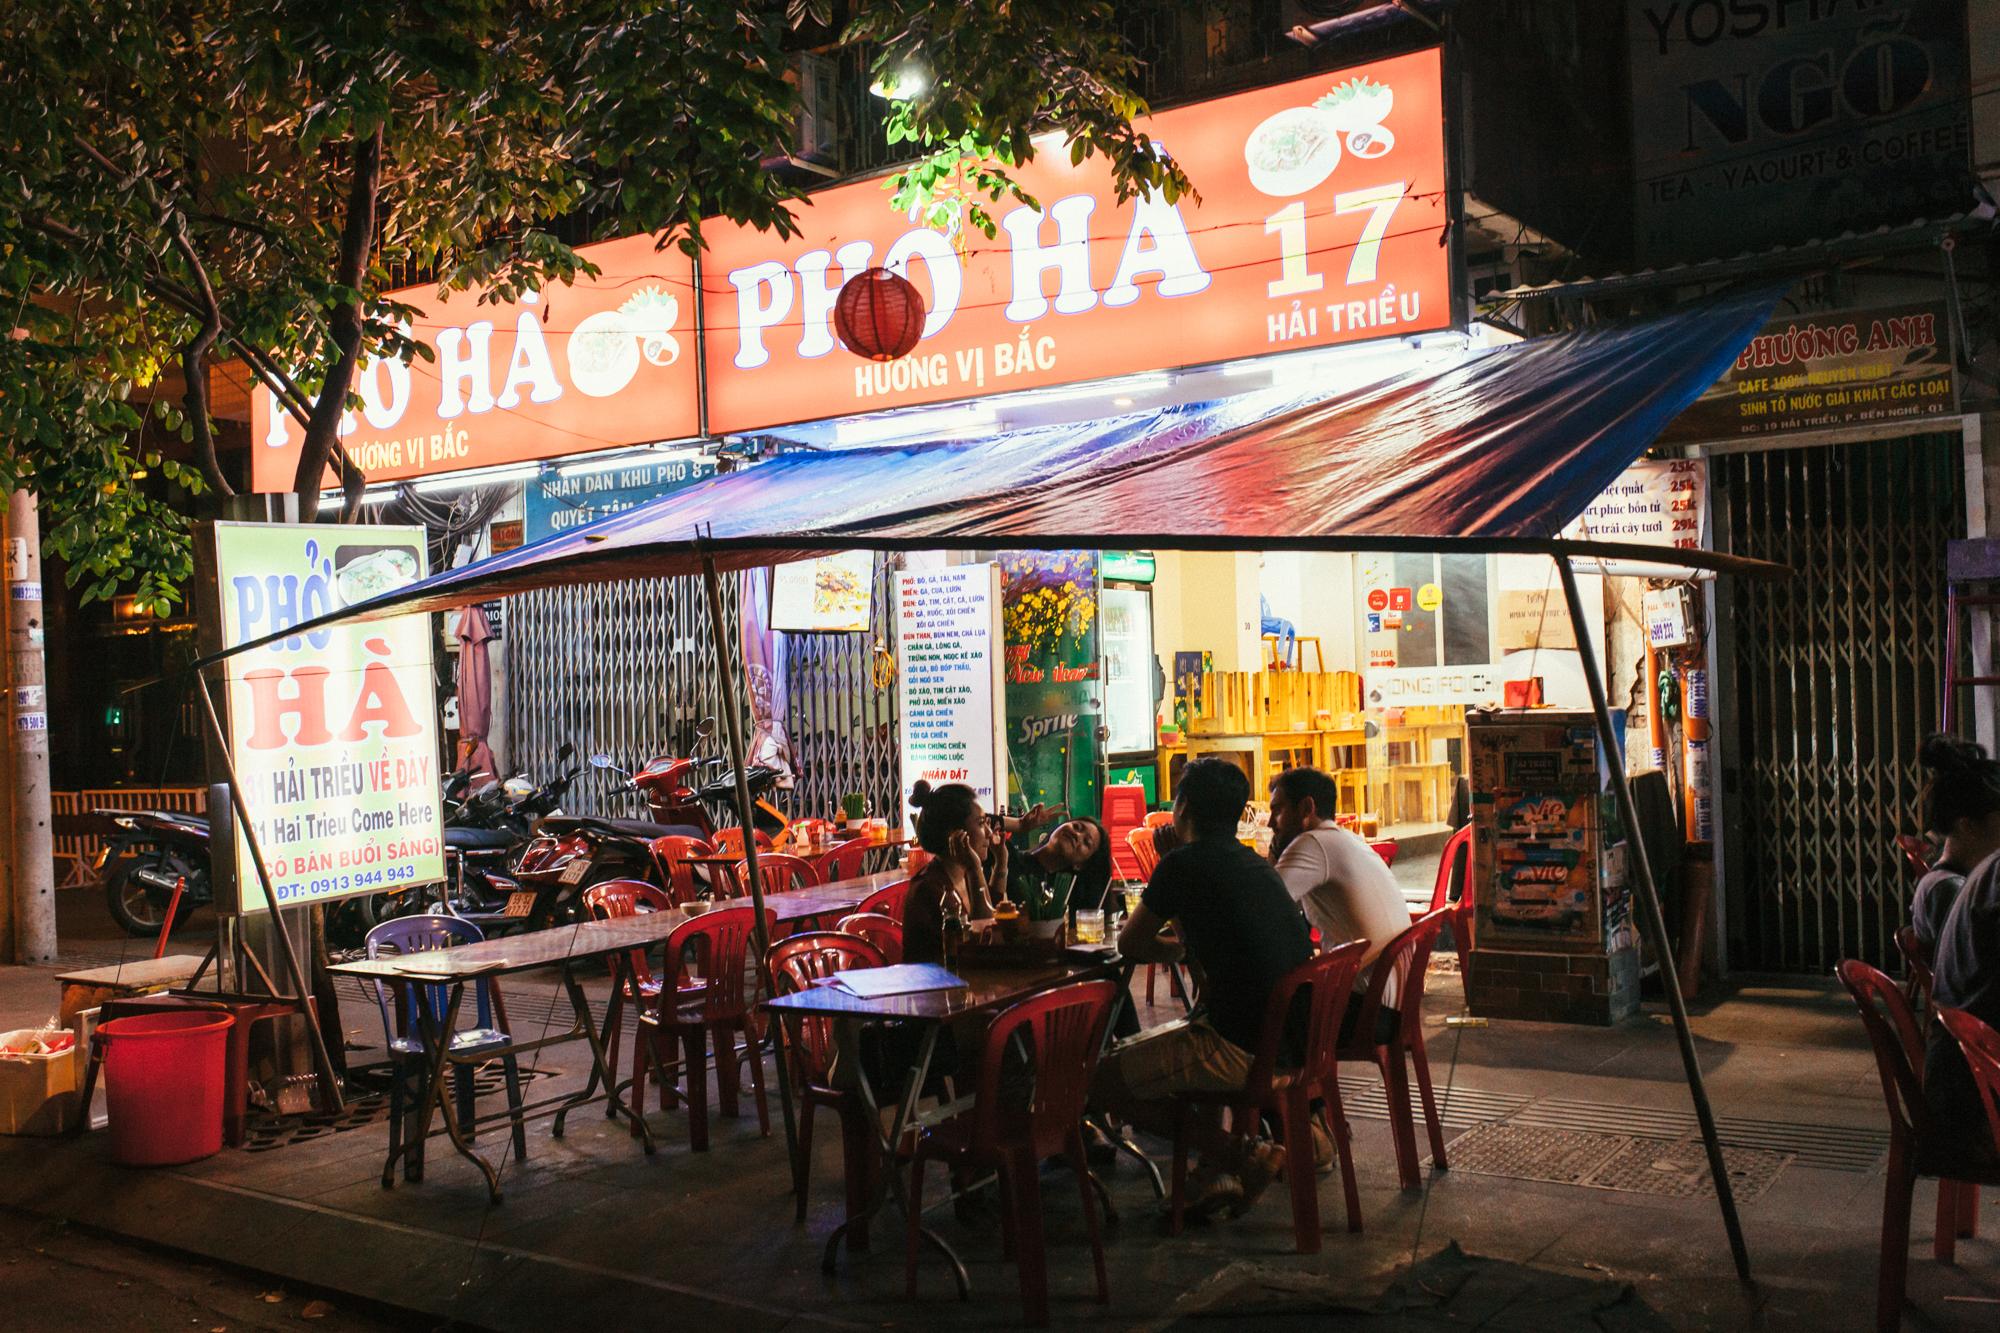 Pho Ha . 19 Hai Trieu St, District 1, Ho Chi Minh City.